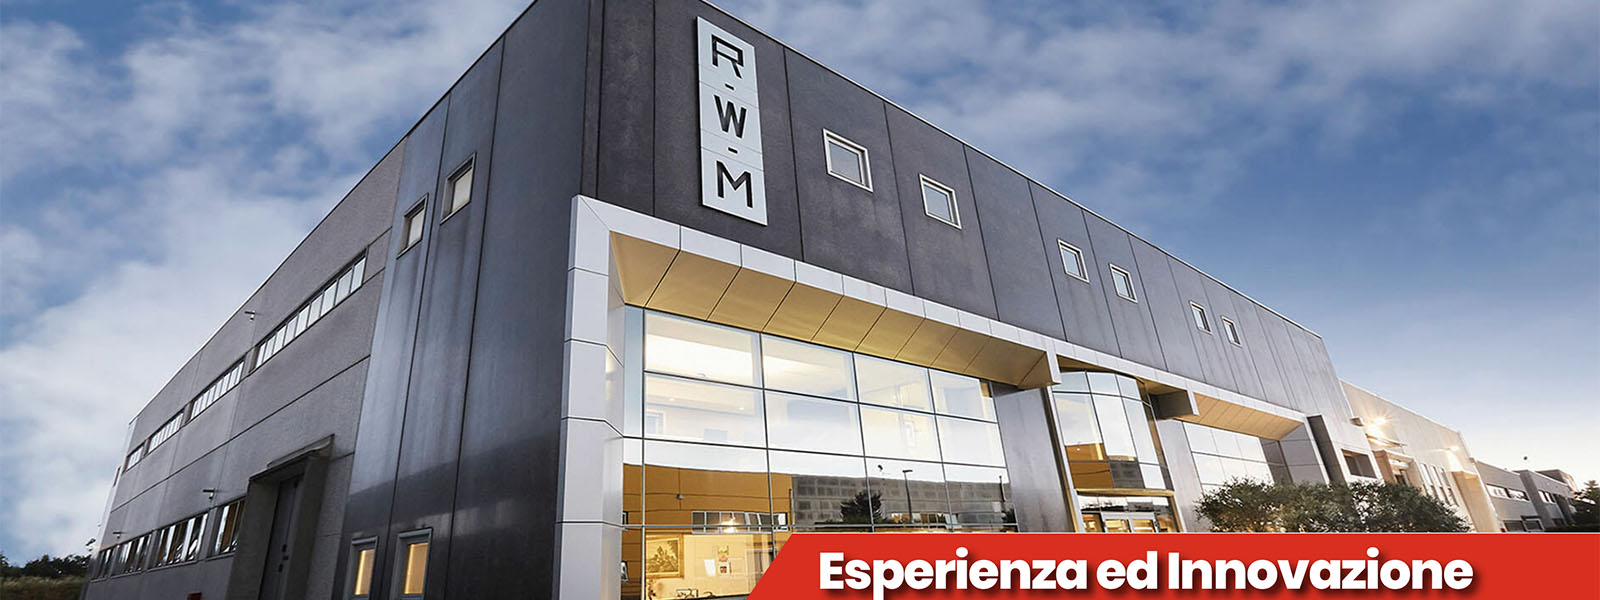 Sito Web RWM Srl Italia